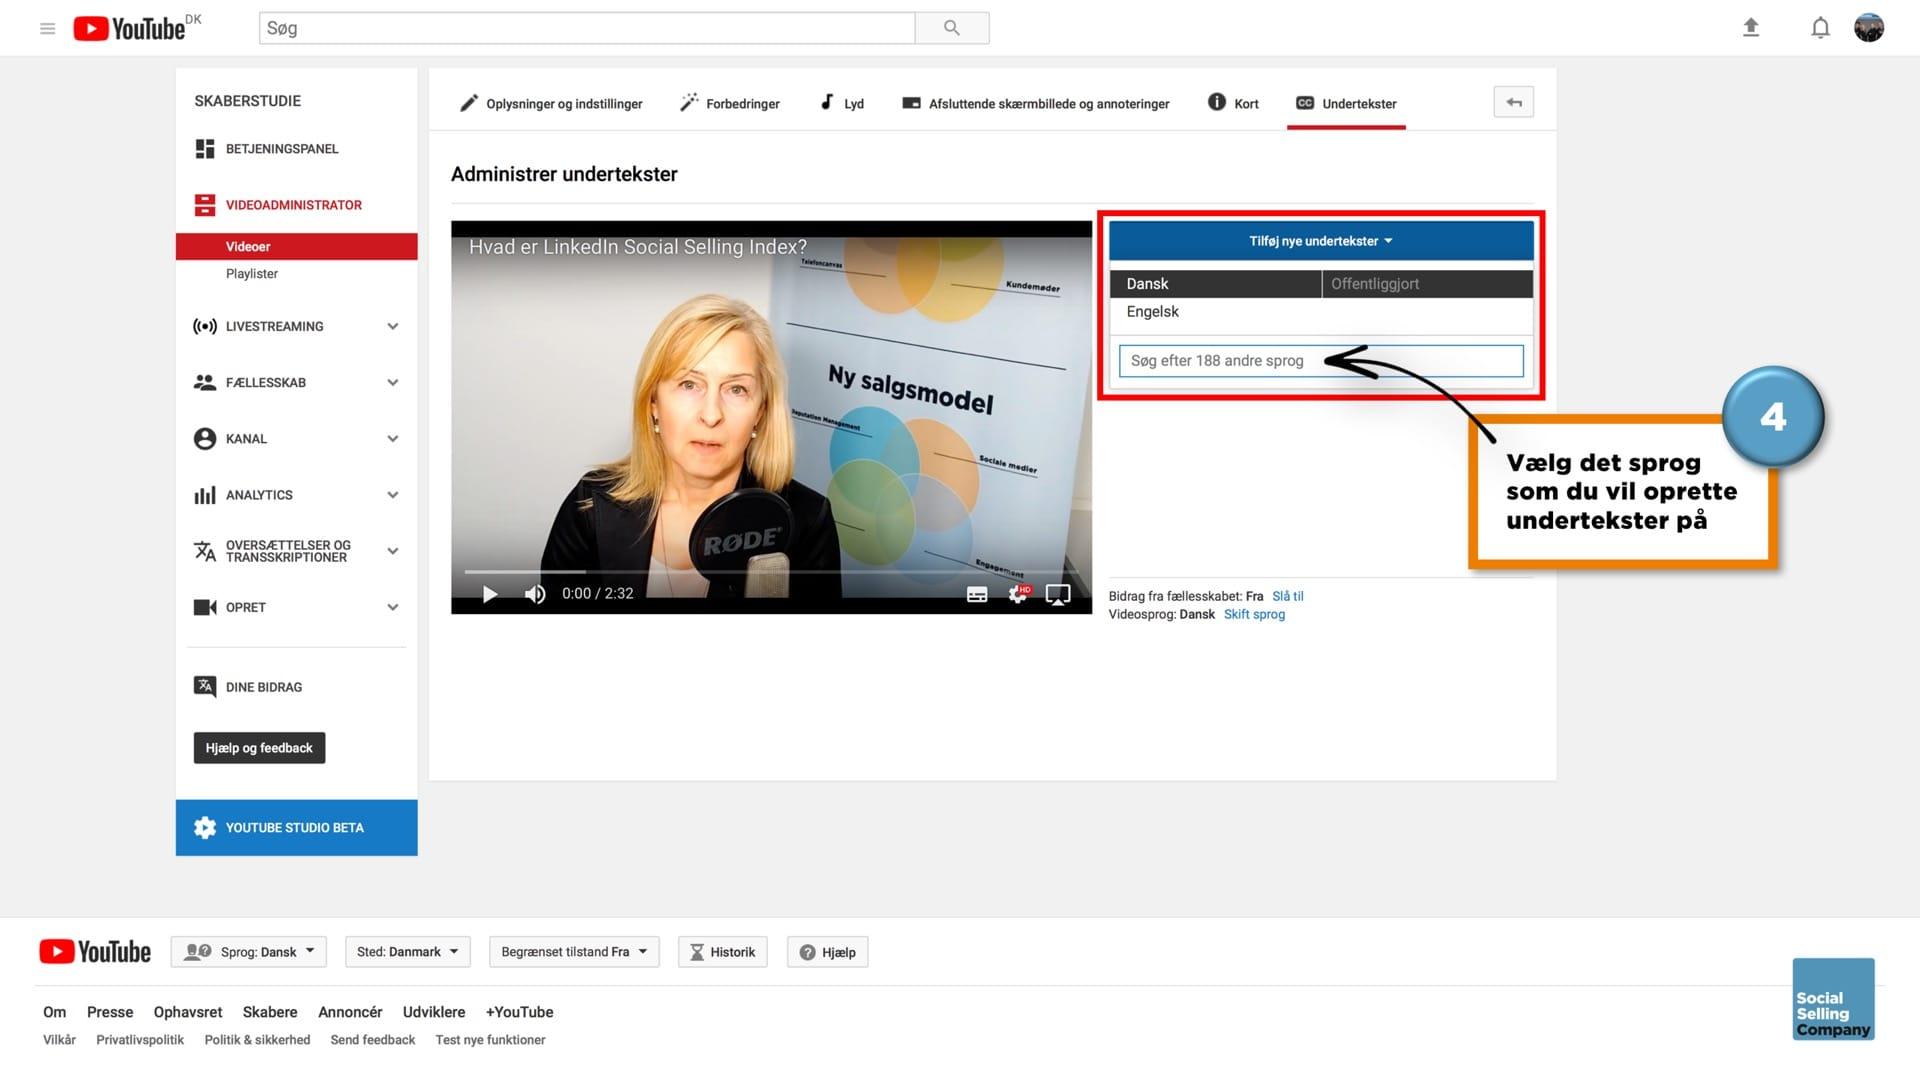 Sådan får du undertekster på videoer på LinkedIn